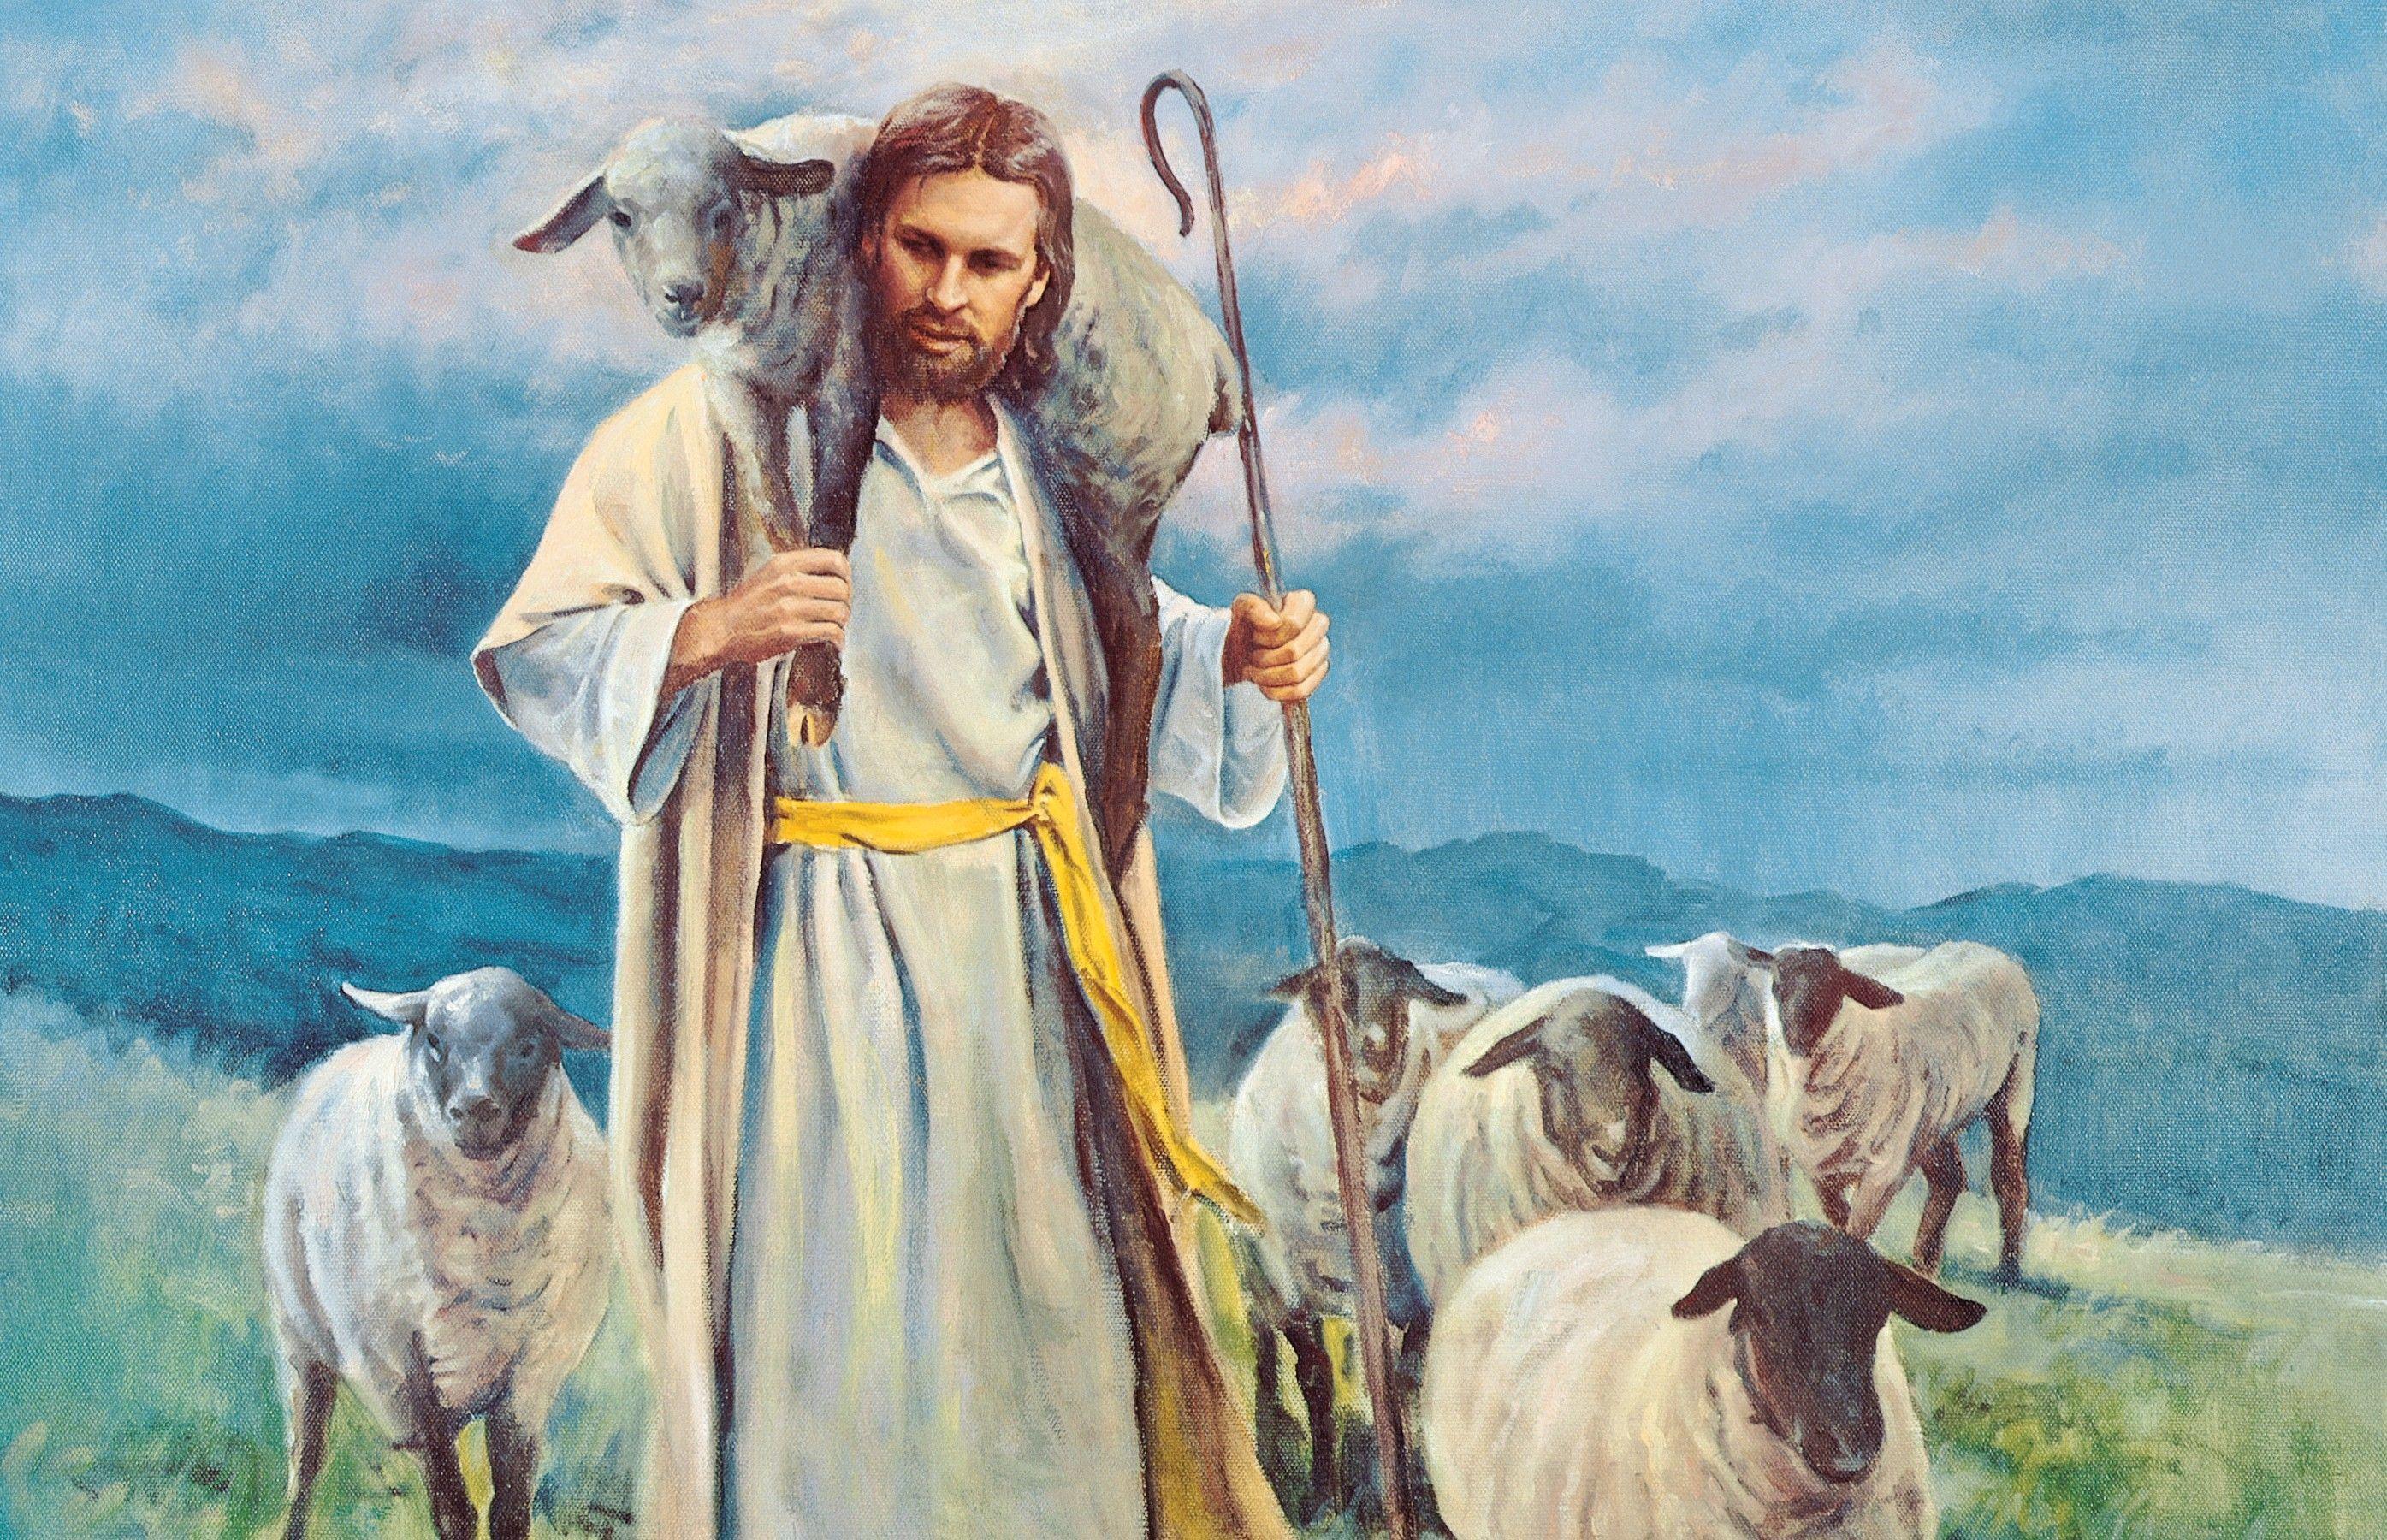 The Good Shepherd, by Del Parson